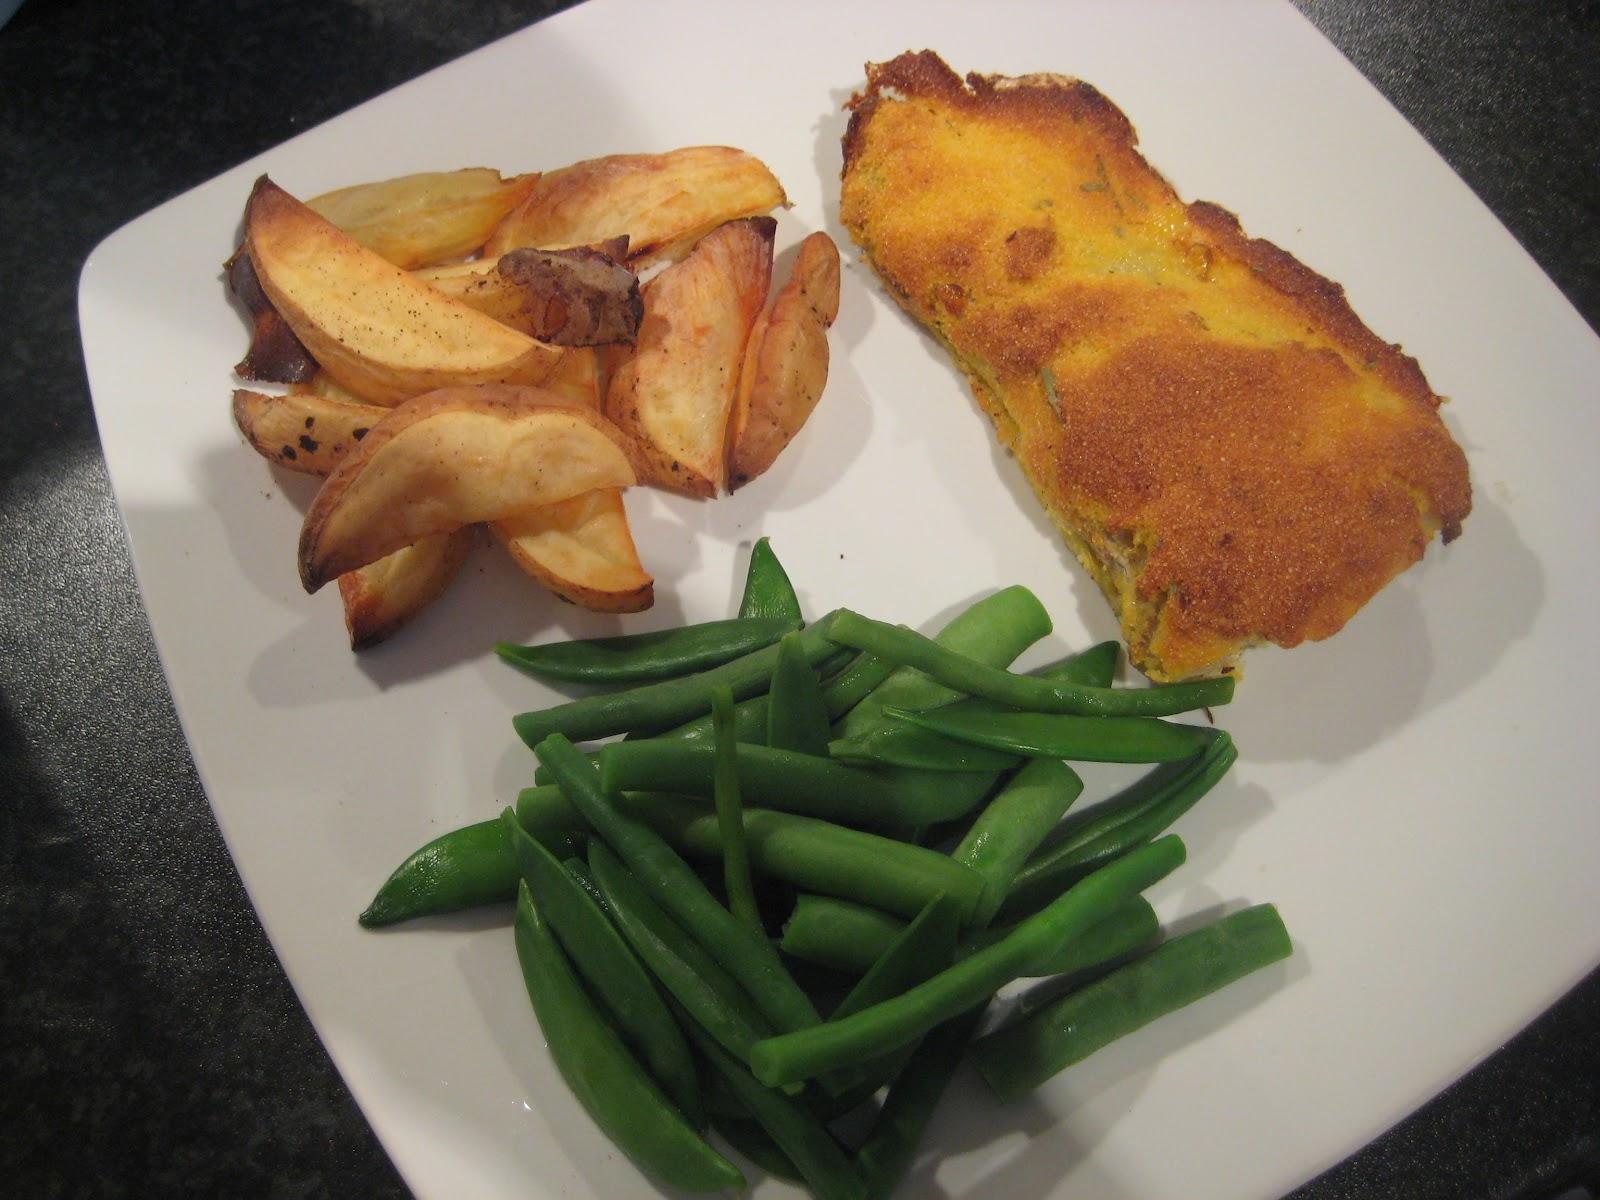 Lemon and Cheese: Daring Cooks August 2012: Cornmeal